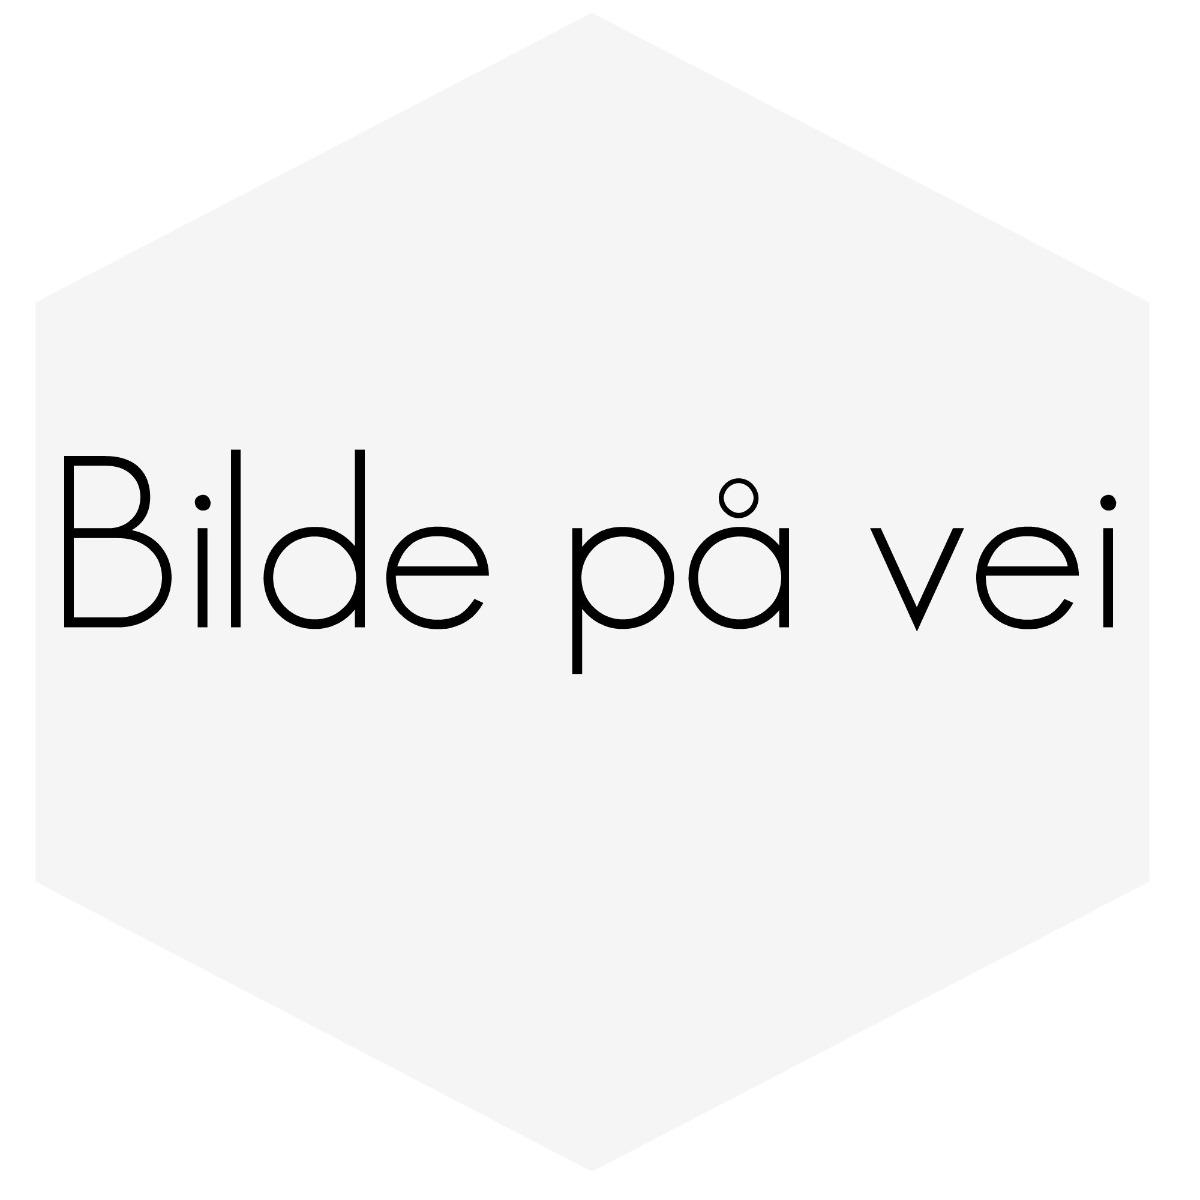 DØRHÅNDTAK UTVENDIG VOLVO 740/940 CROM/SORT VENSTRE 6846644